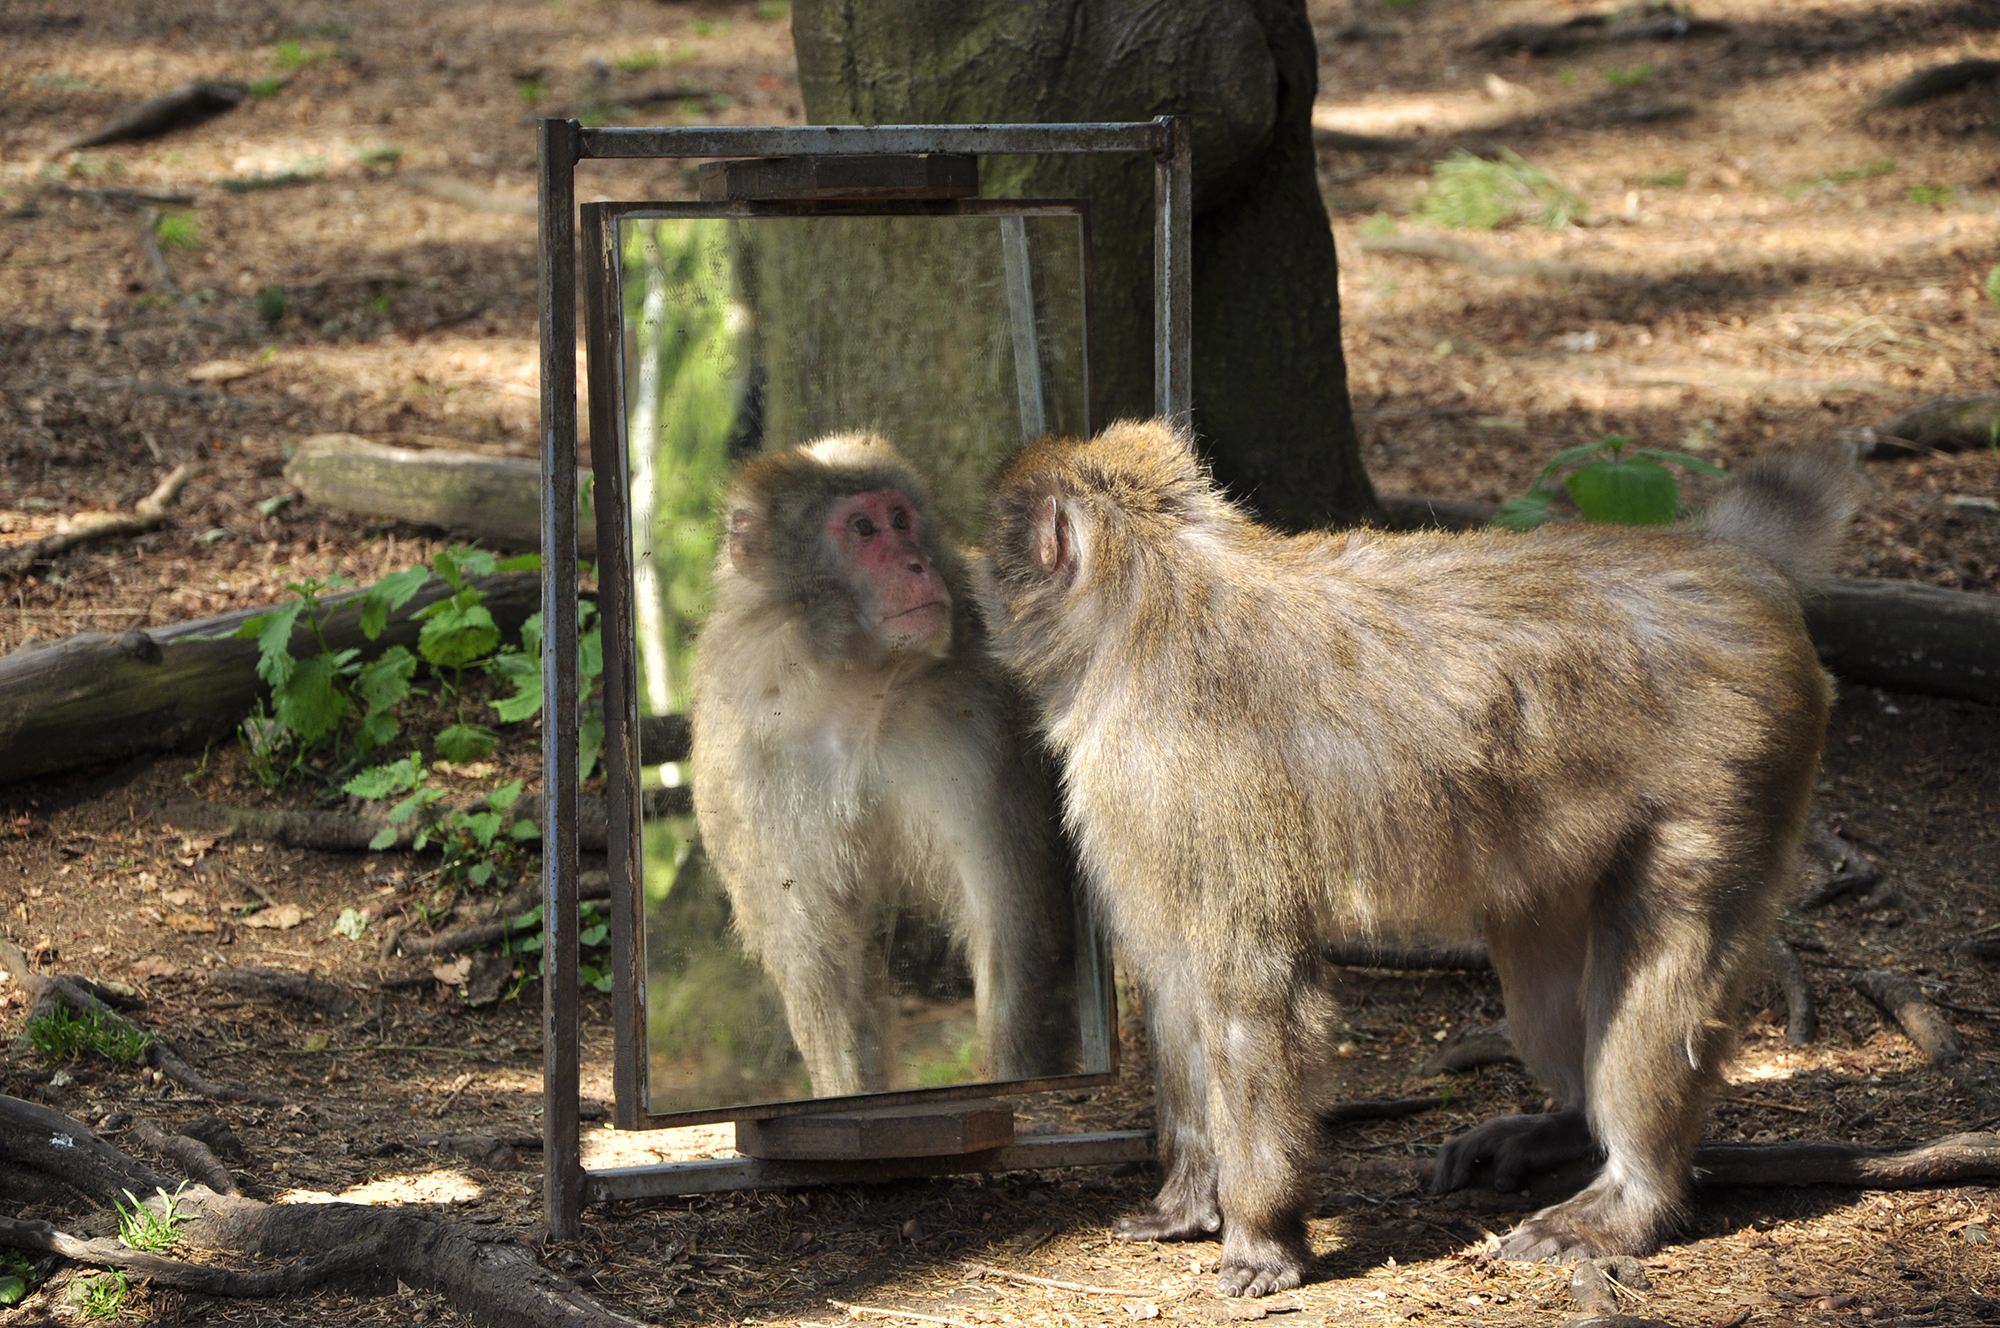 обезьянка и зеркало картинки делали